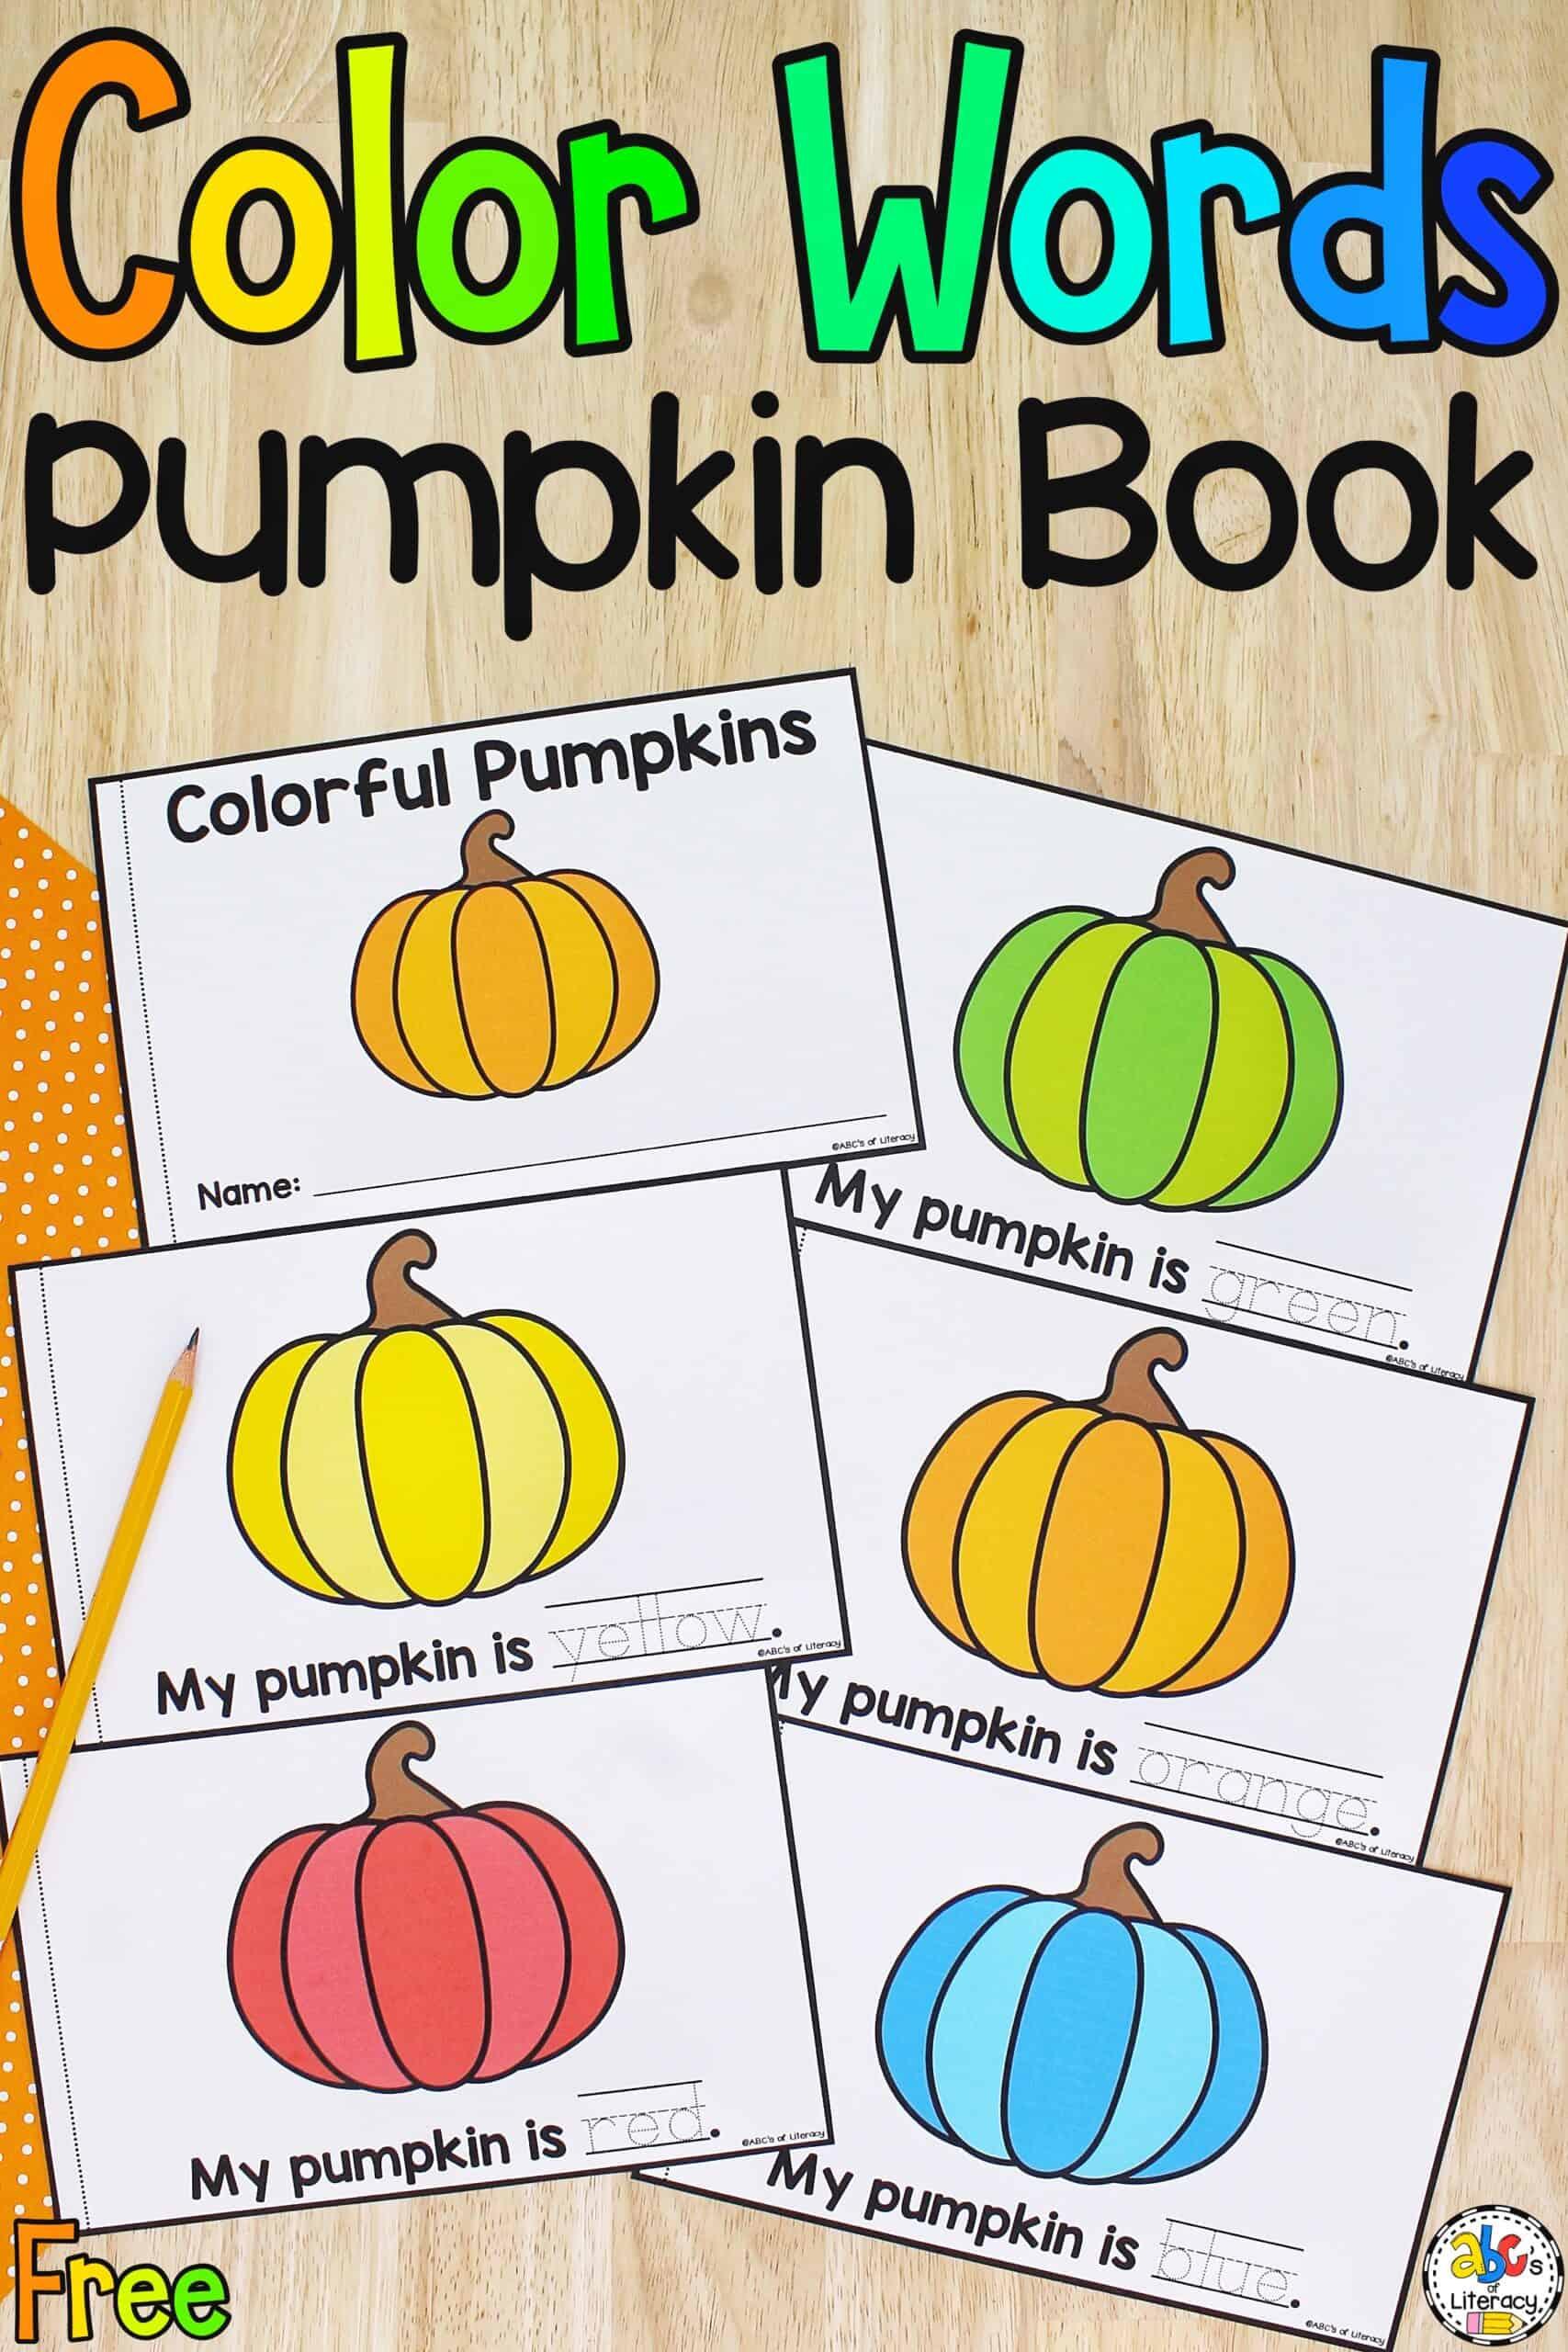 Color Words Pumpkin Book